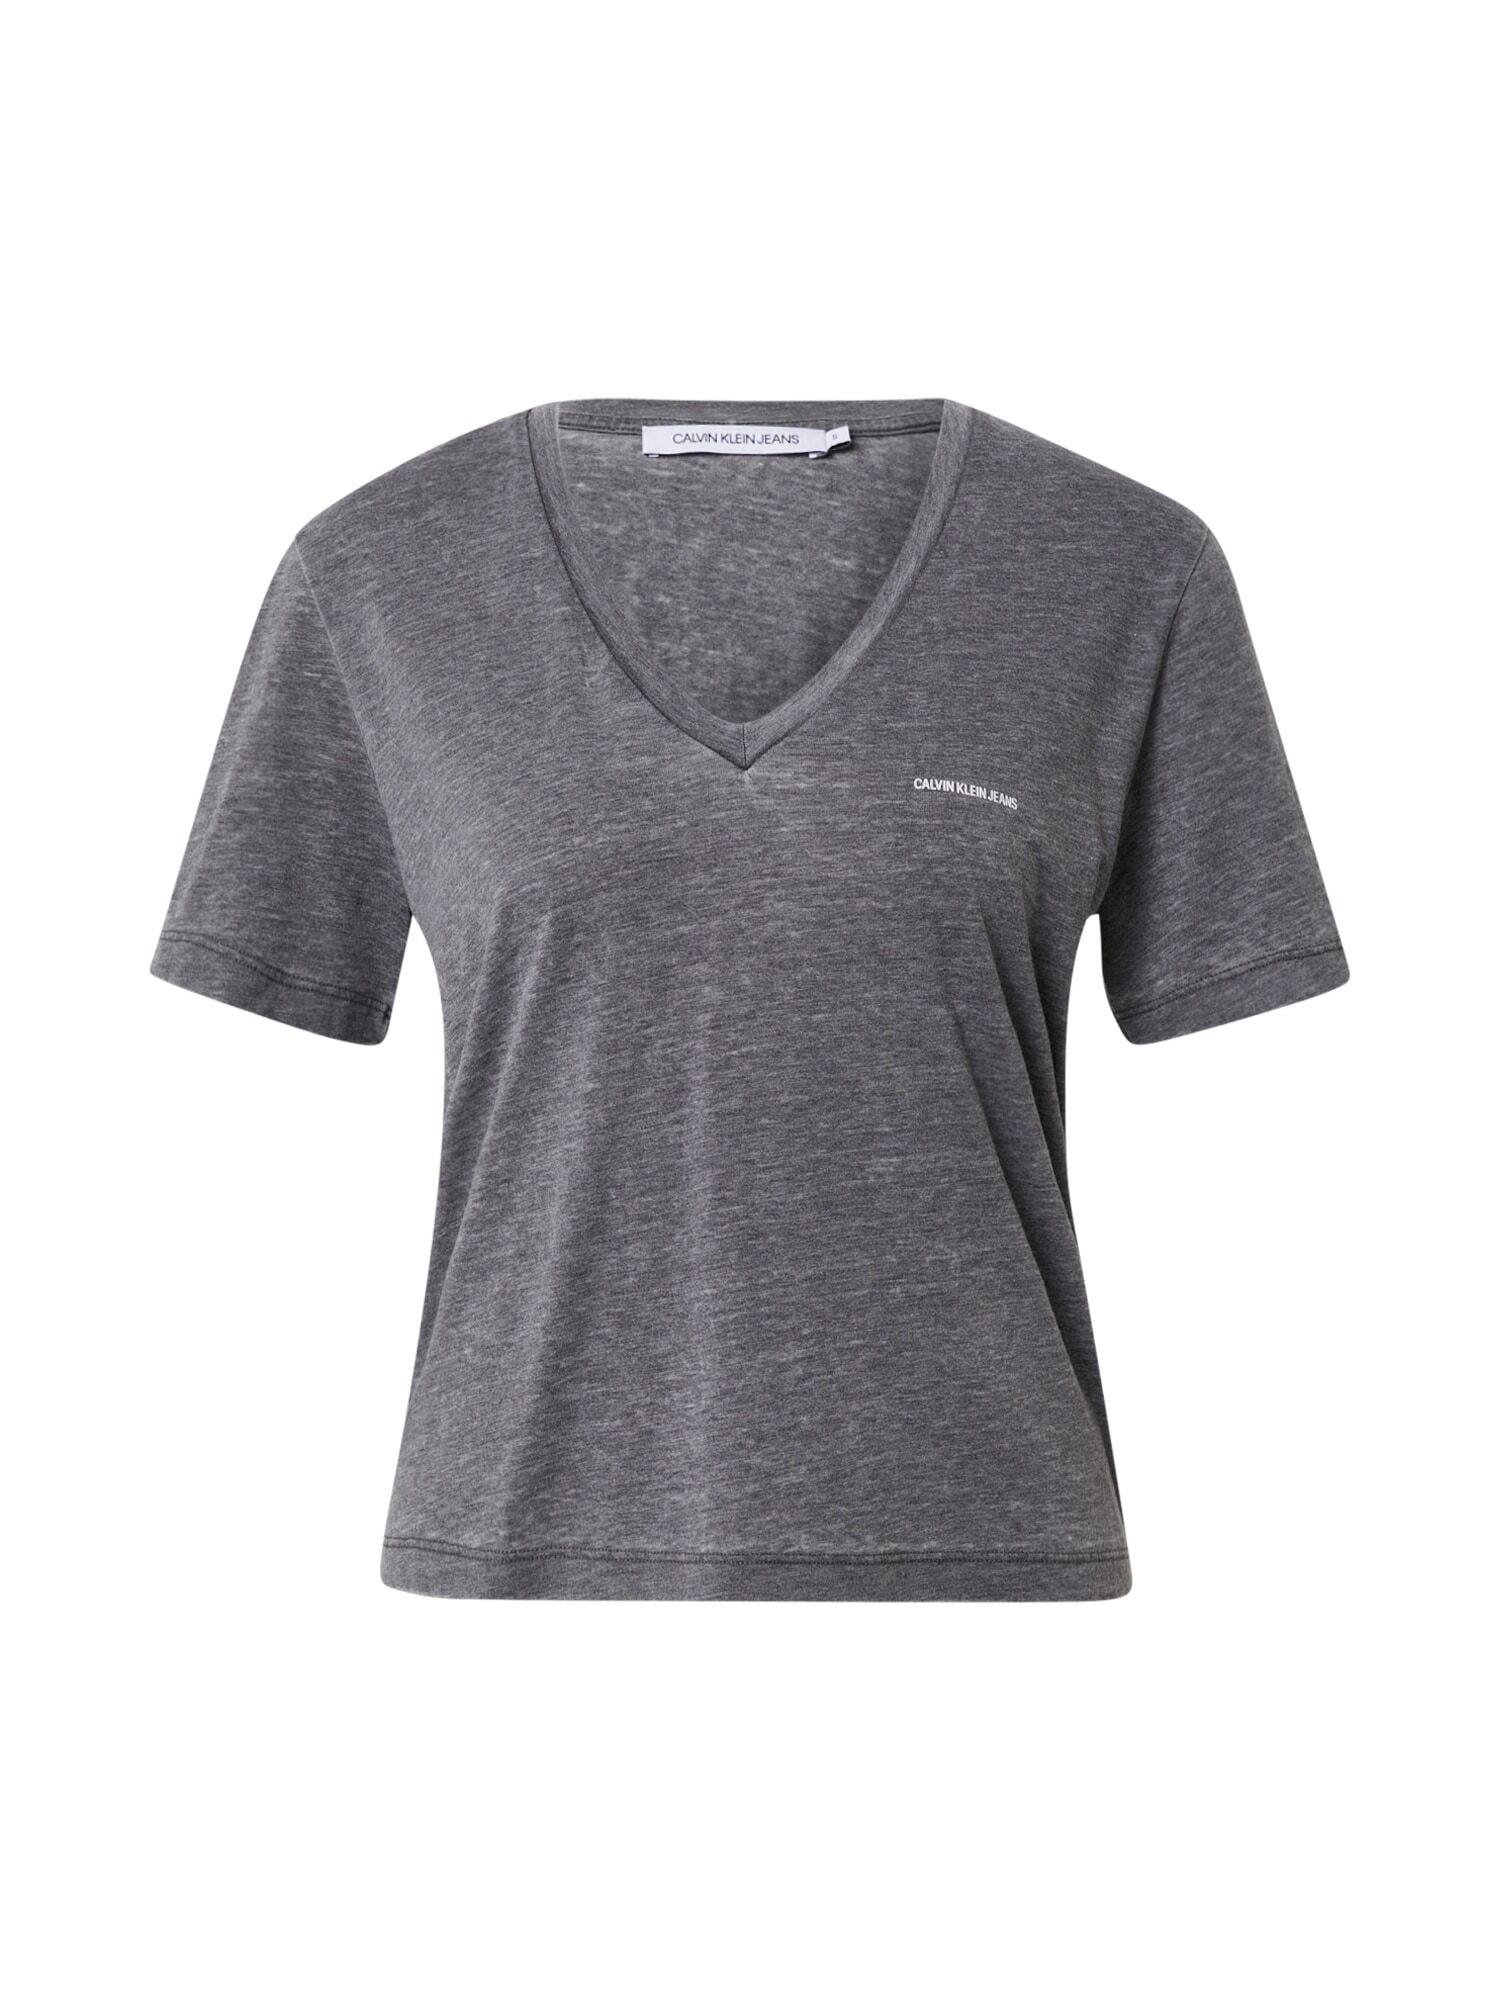 Calvin T-shirt 'BURN OUT'  - Noir - Taille: S - female